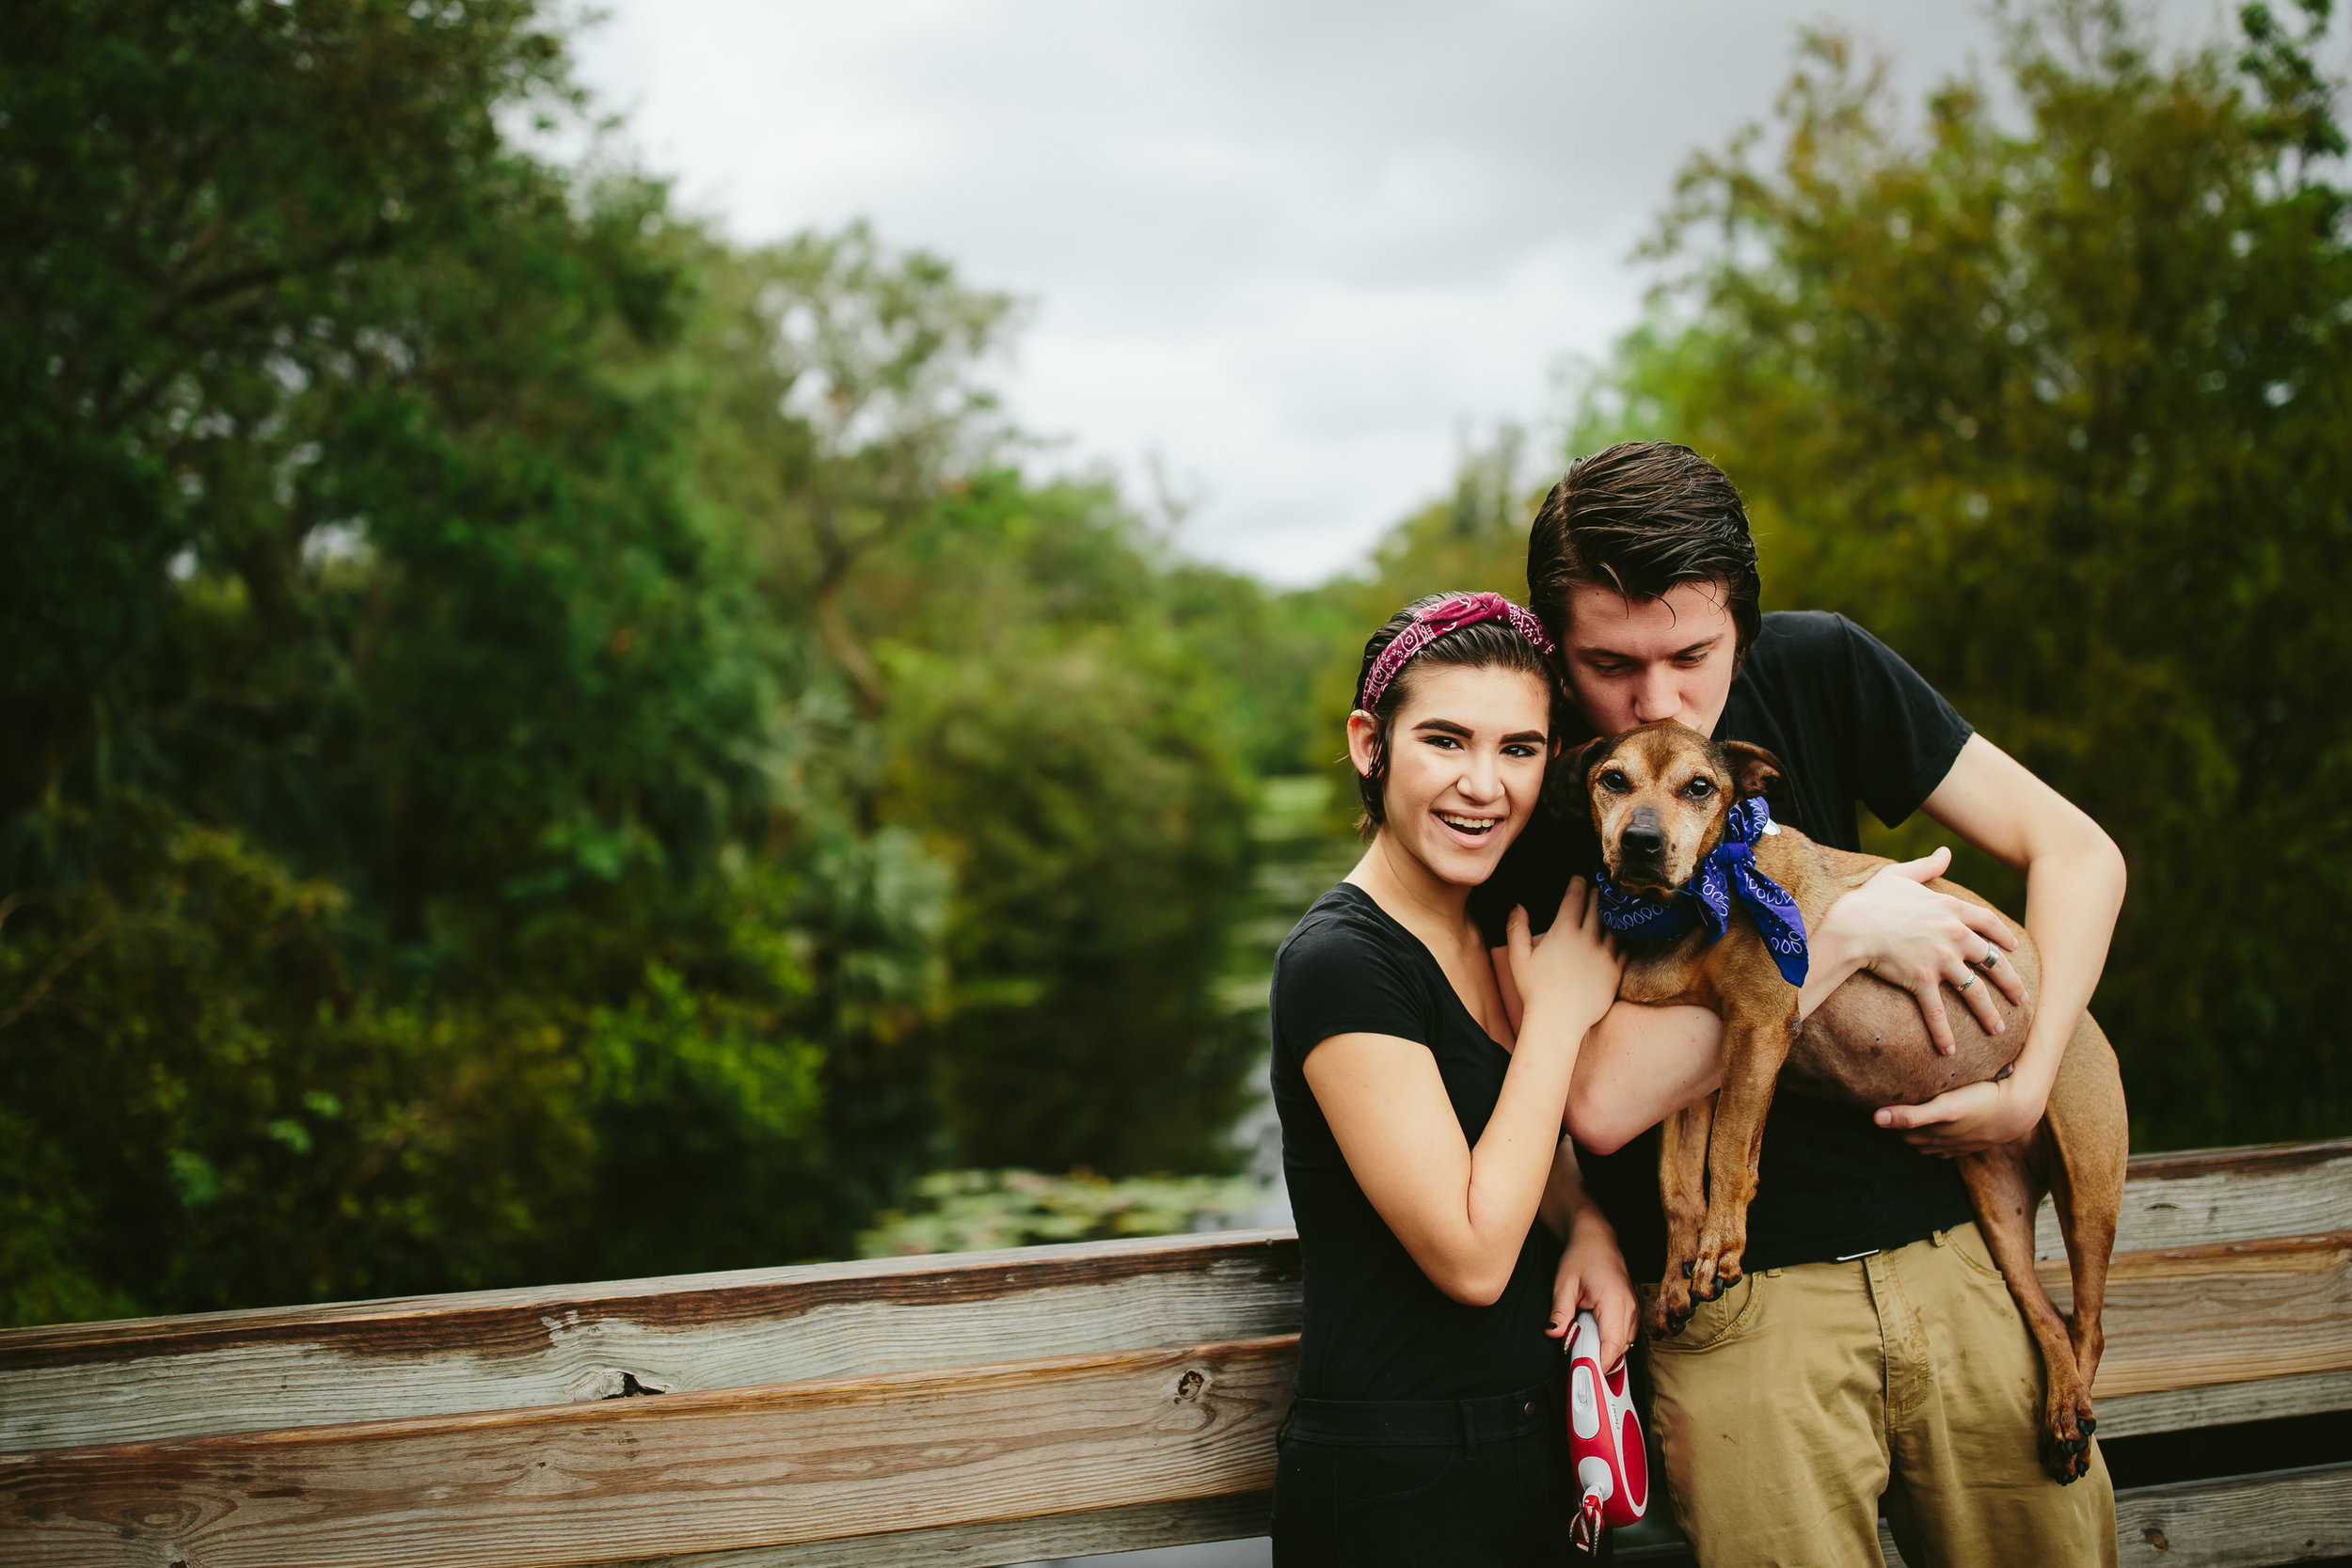 couple-with-puppy-tiny-house-photo.jpg